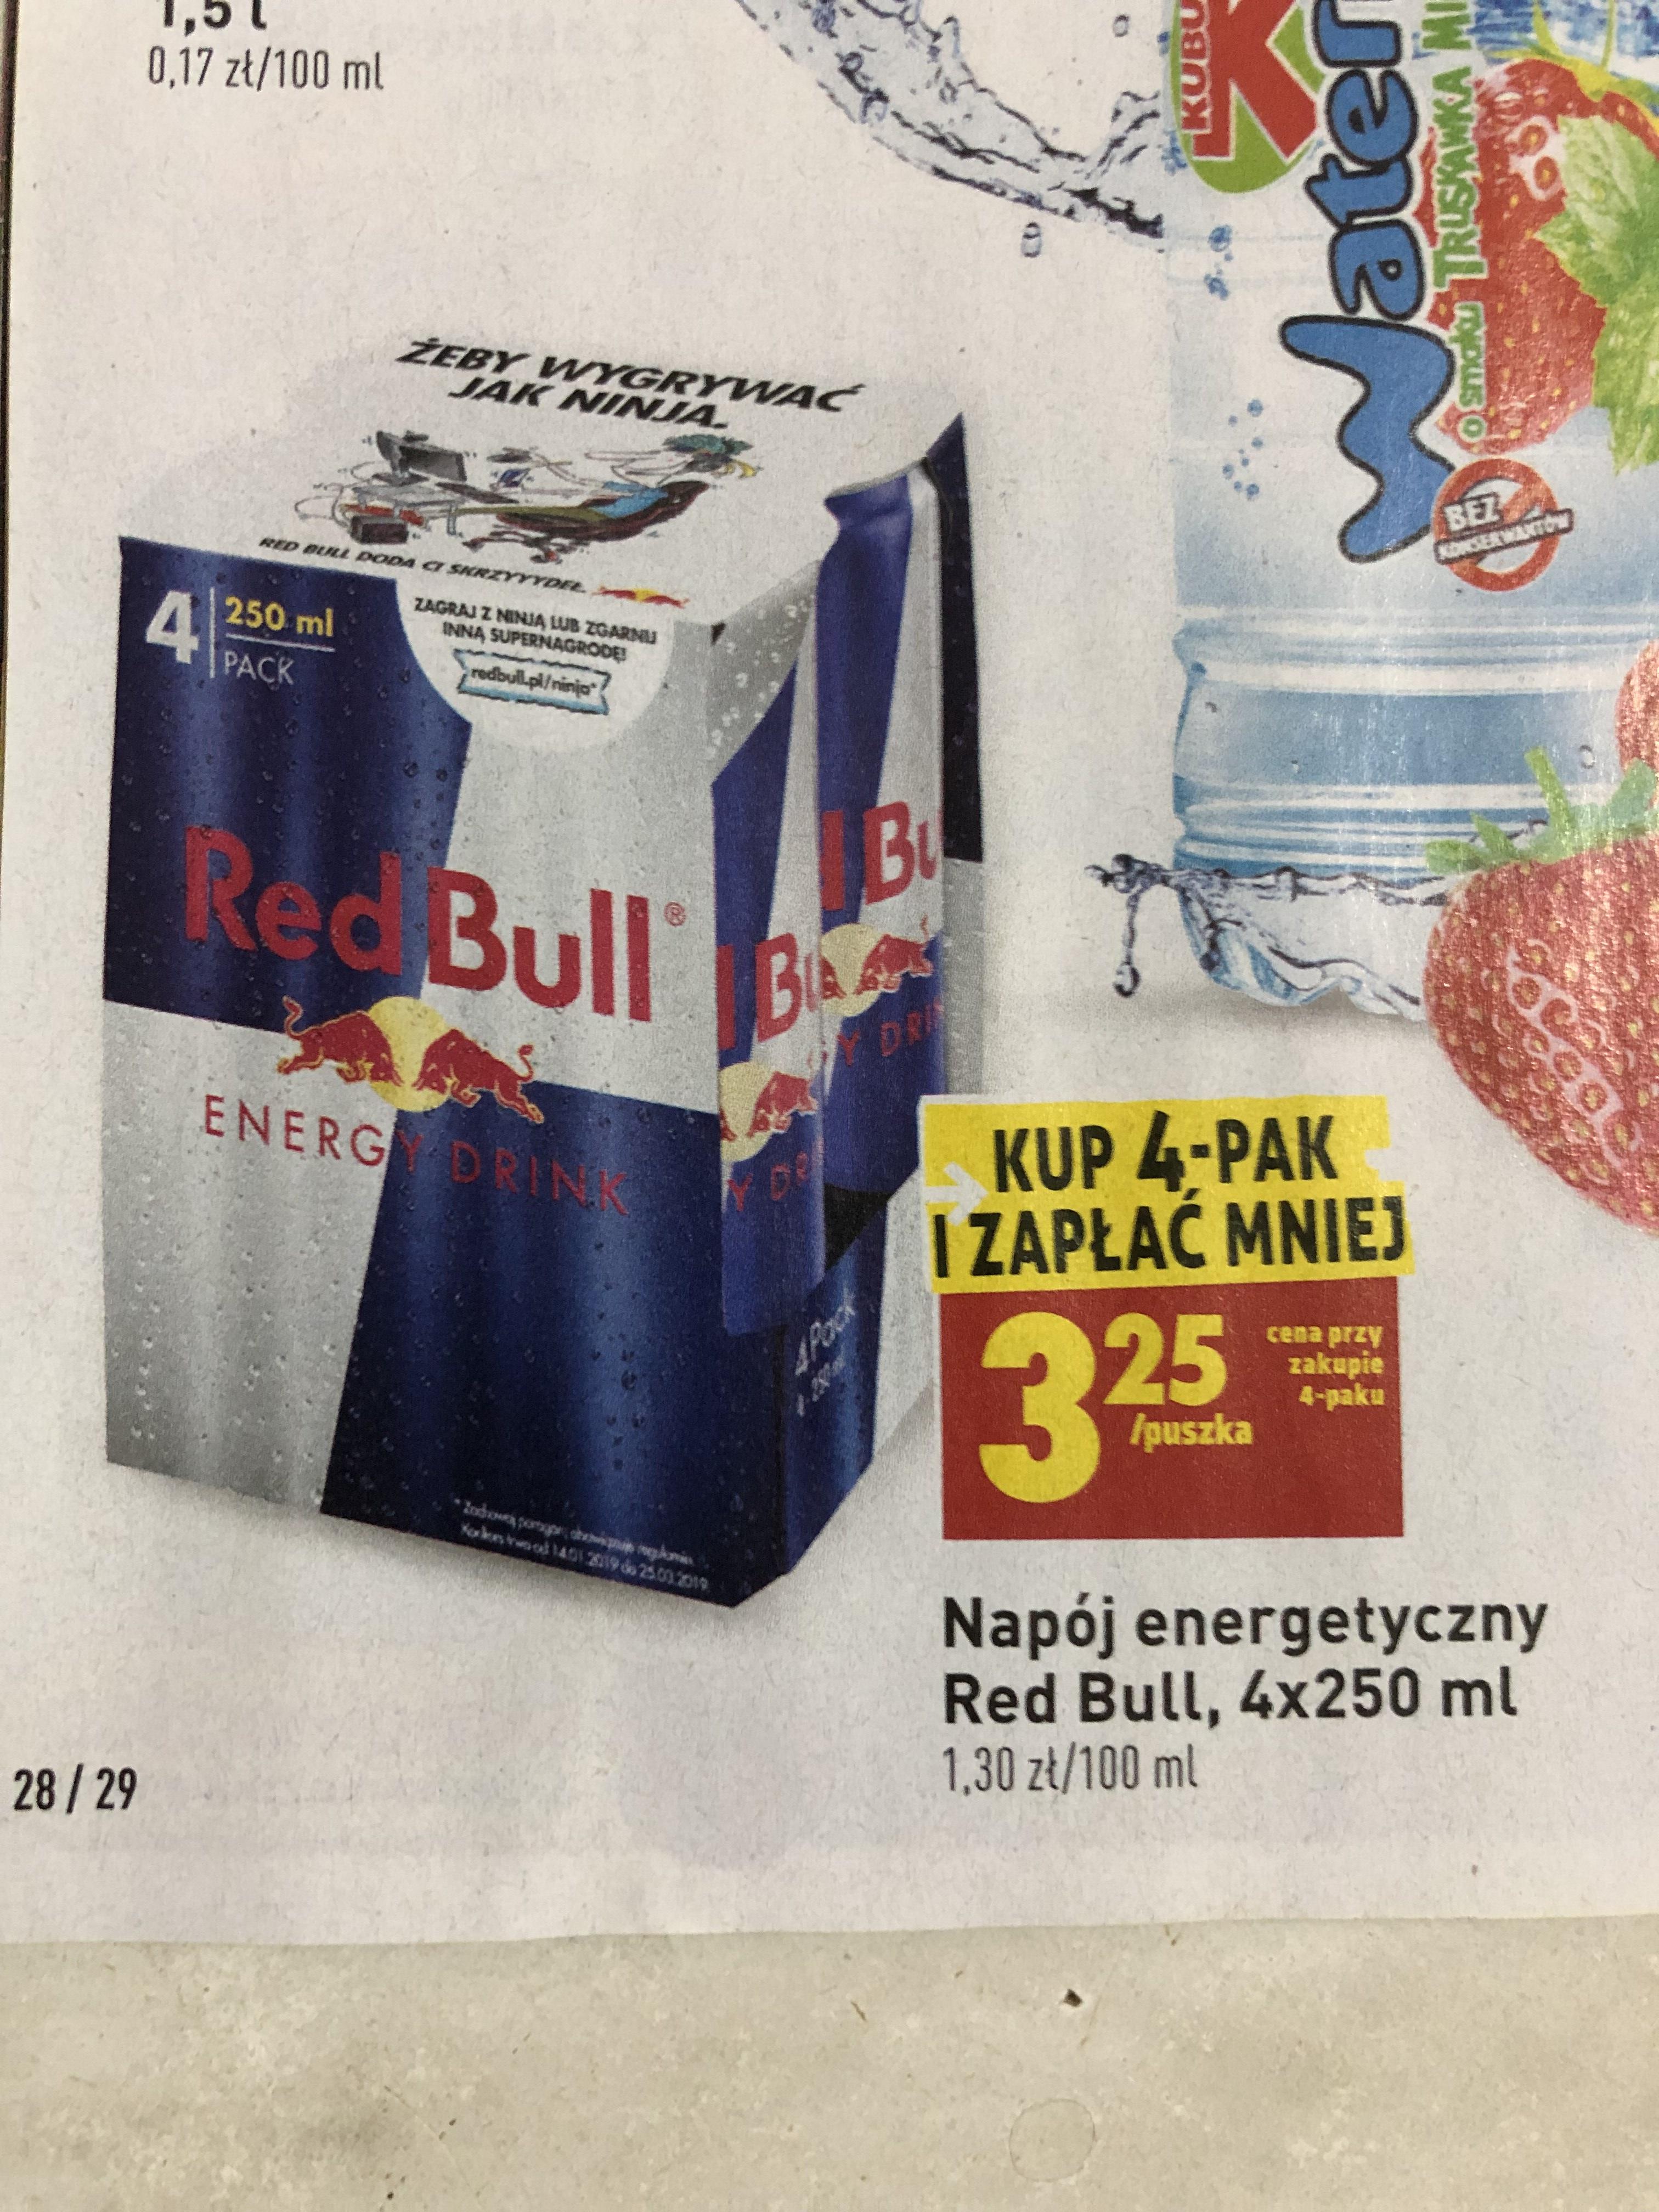 Biedronka Red Bull 4-pak